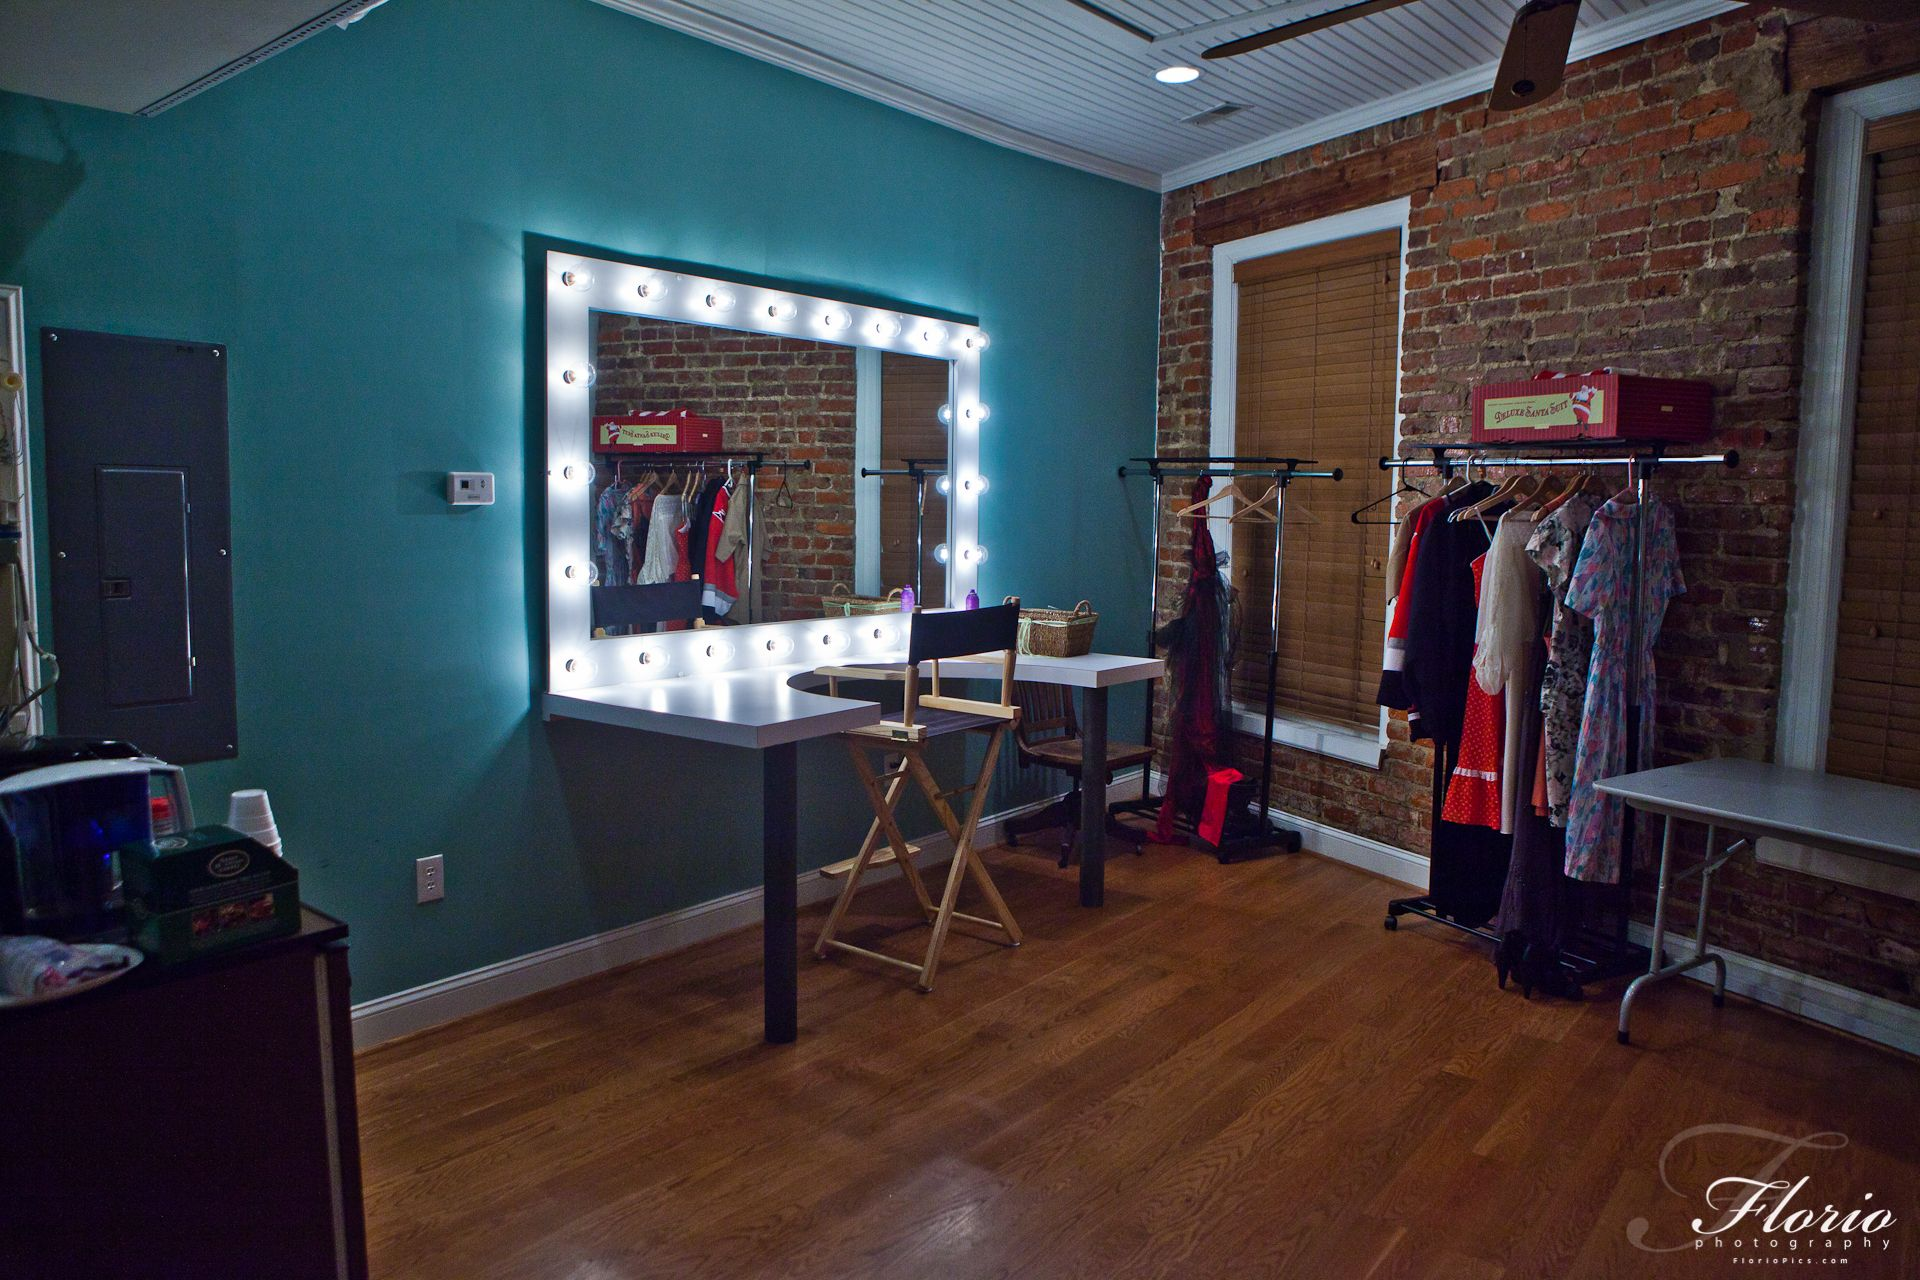 makeup room - Google Search  Dressing room, Room, Makeup rooms